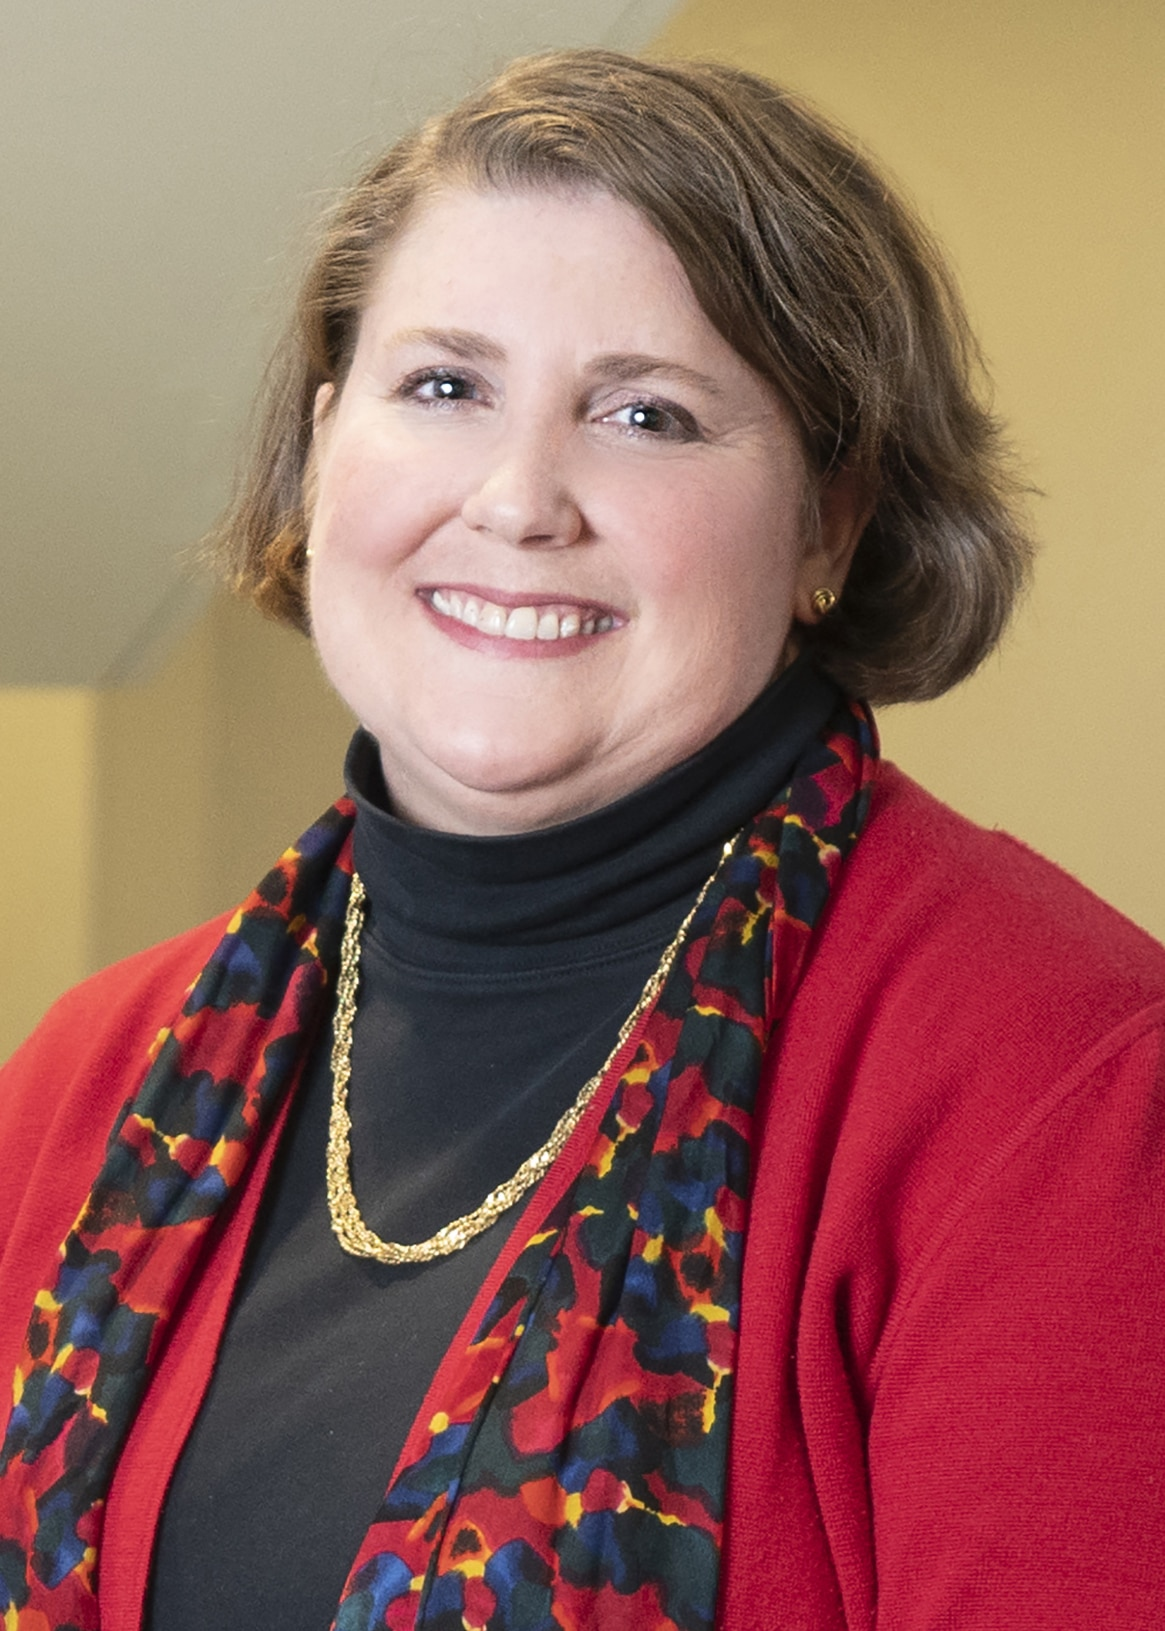 A profile image of Megan A. Gajewski Barnhill